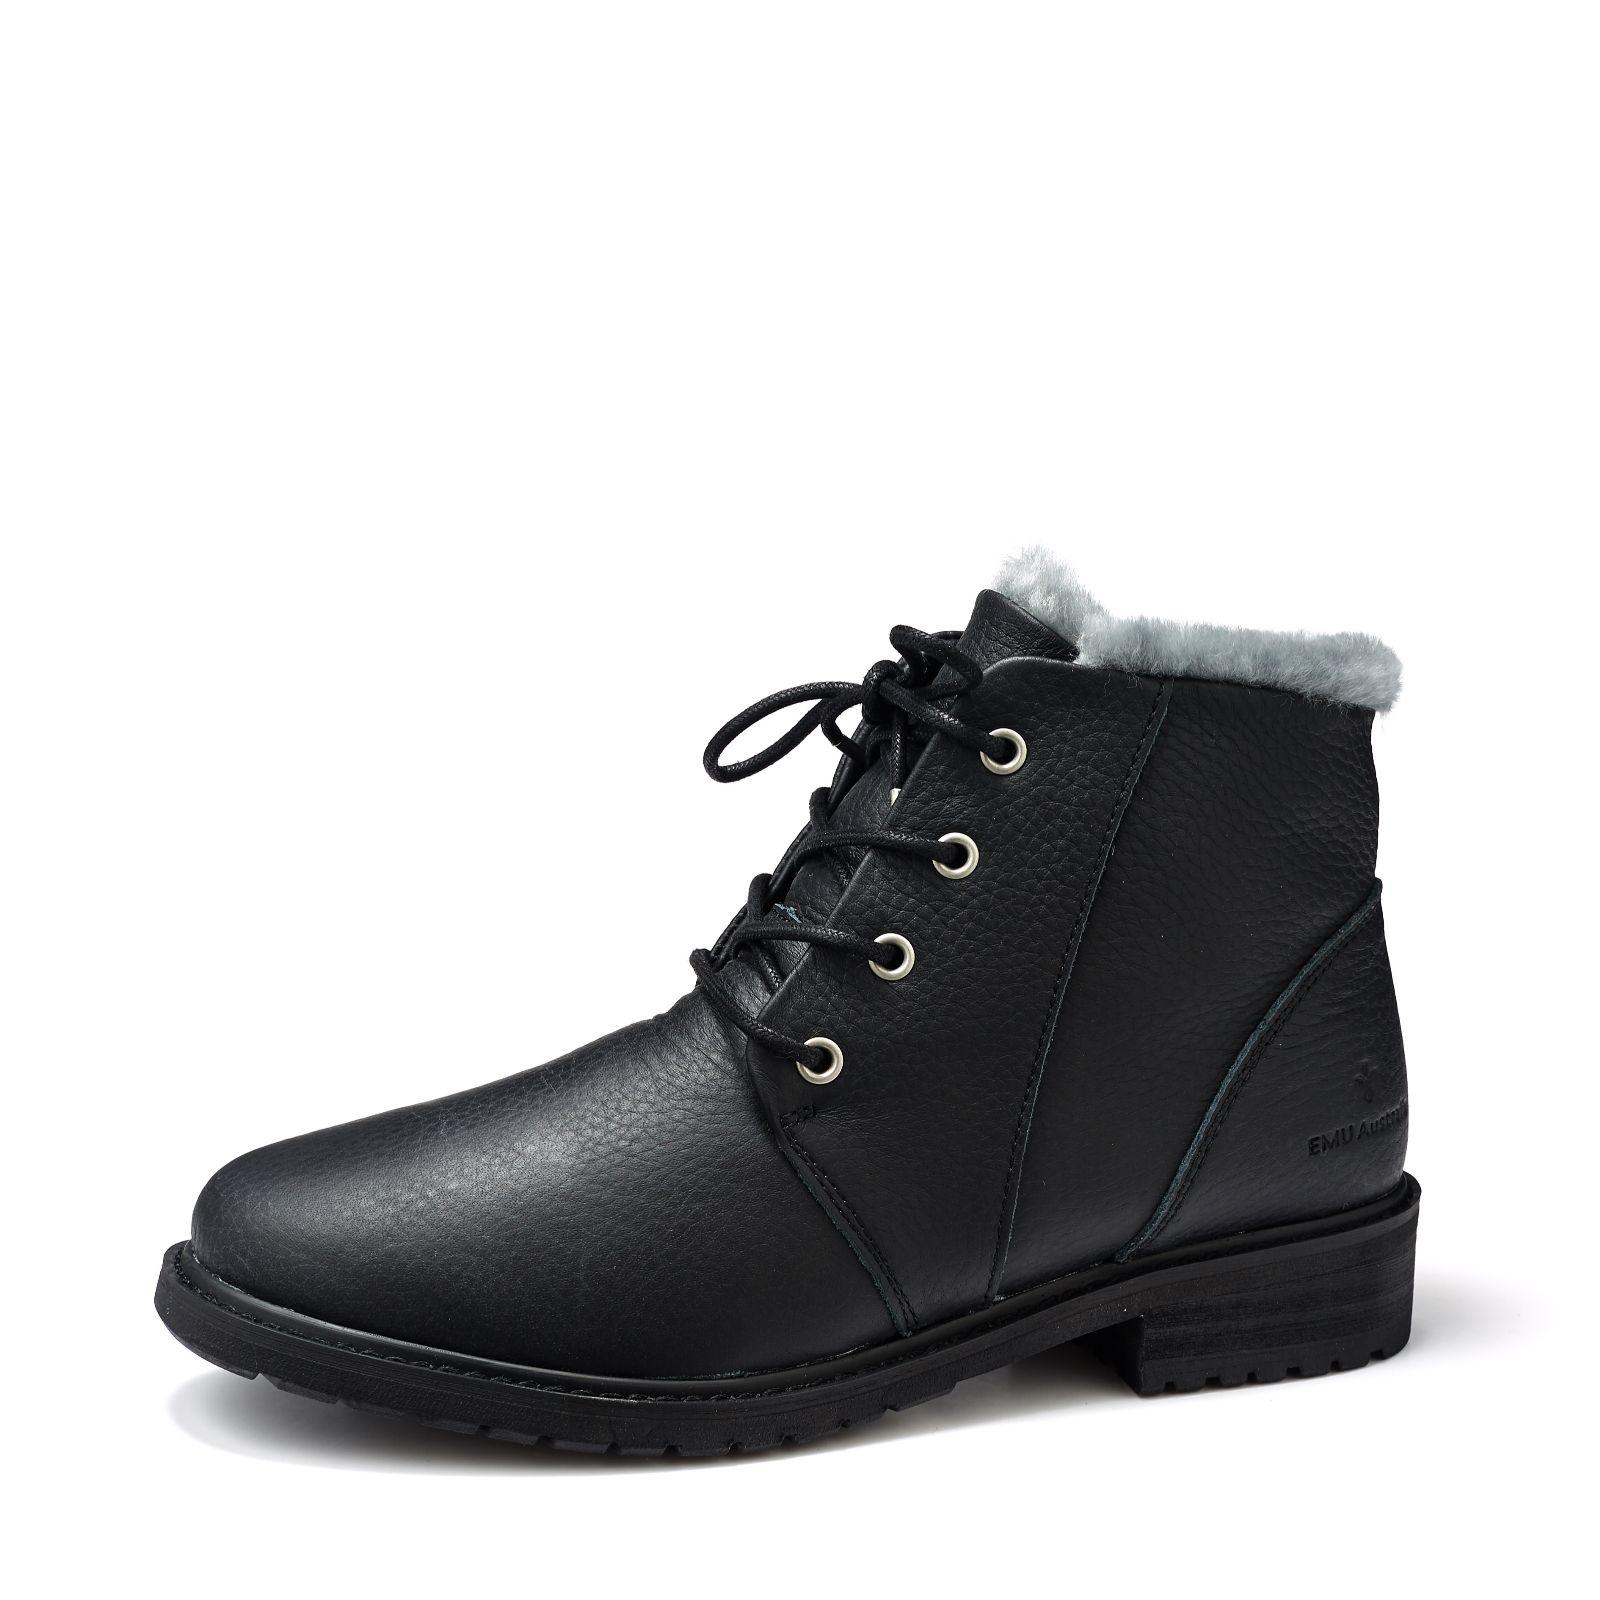 951386a047e Emu Explorer Waterproof Kan Leather & Sheepskin Lace Up Boot - QVC UK